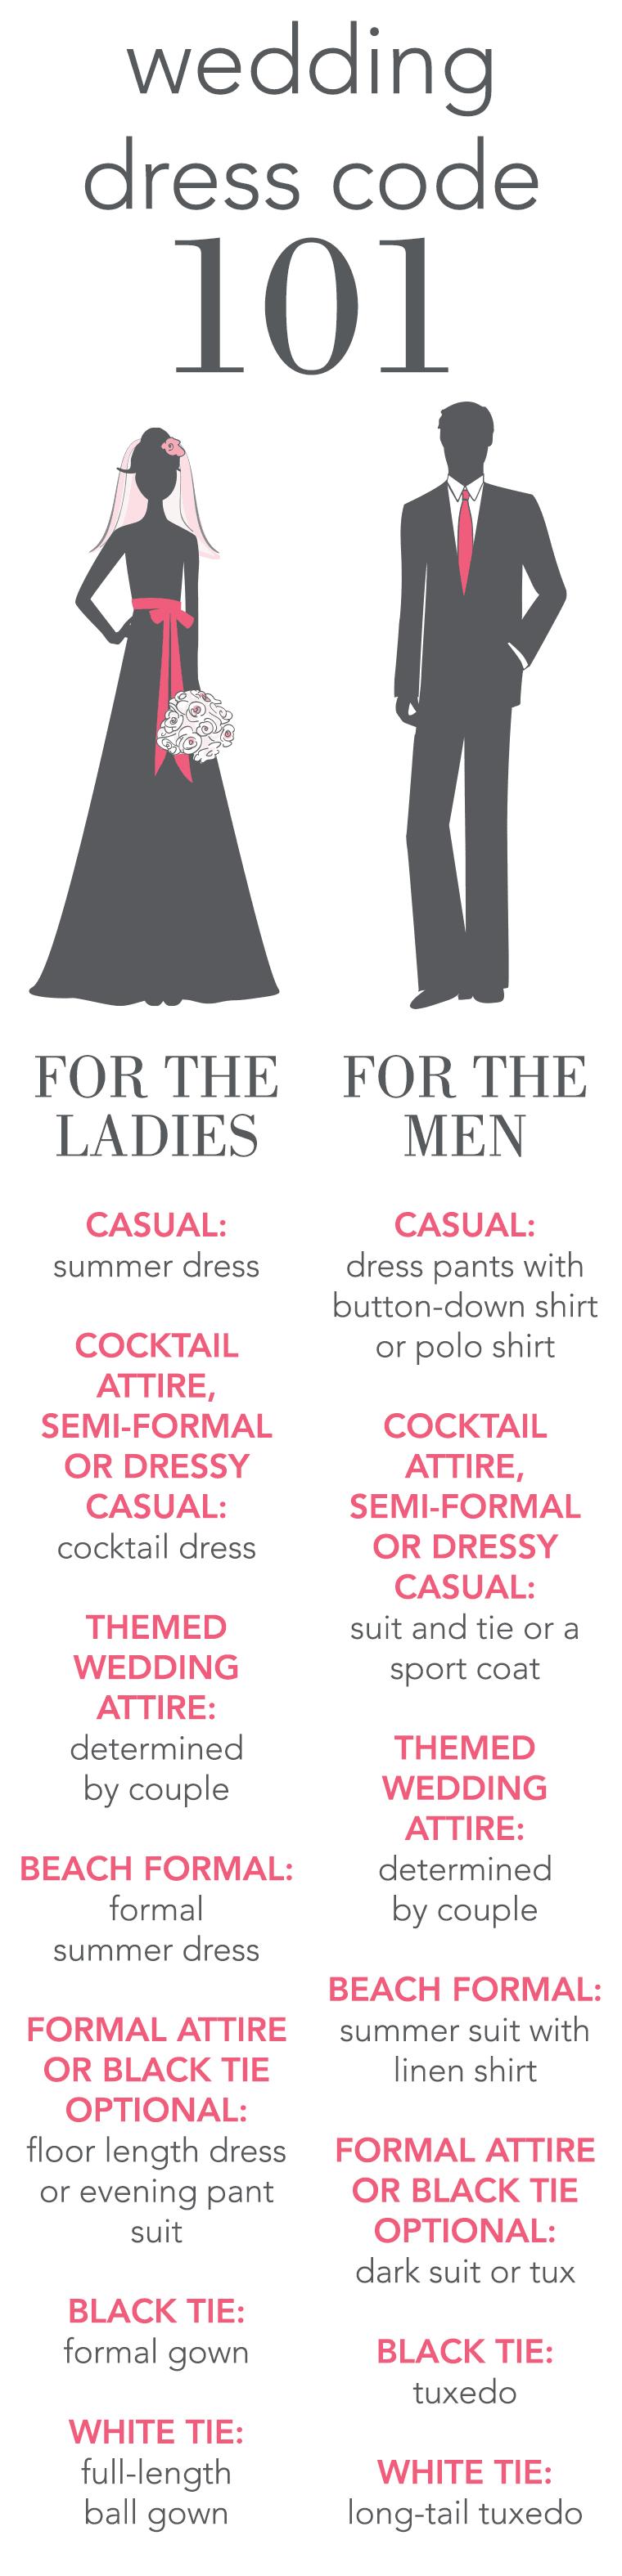 Wedding Attire Dress Code Wording